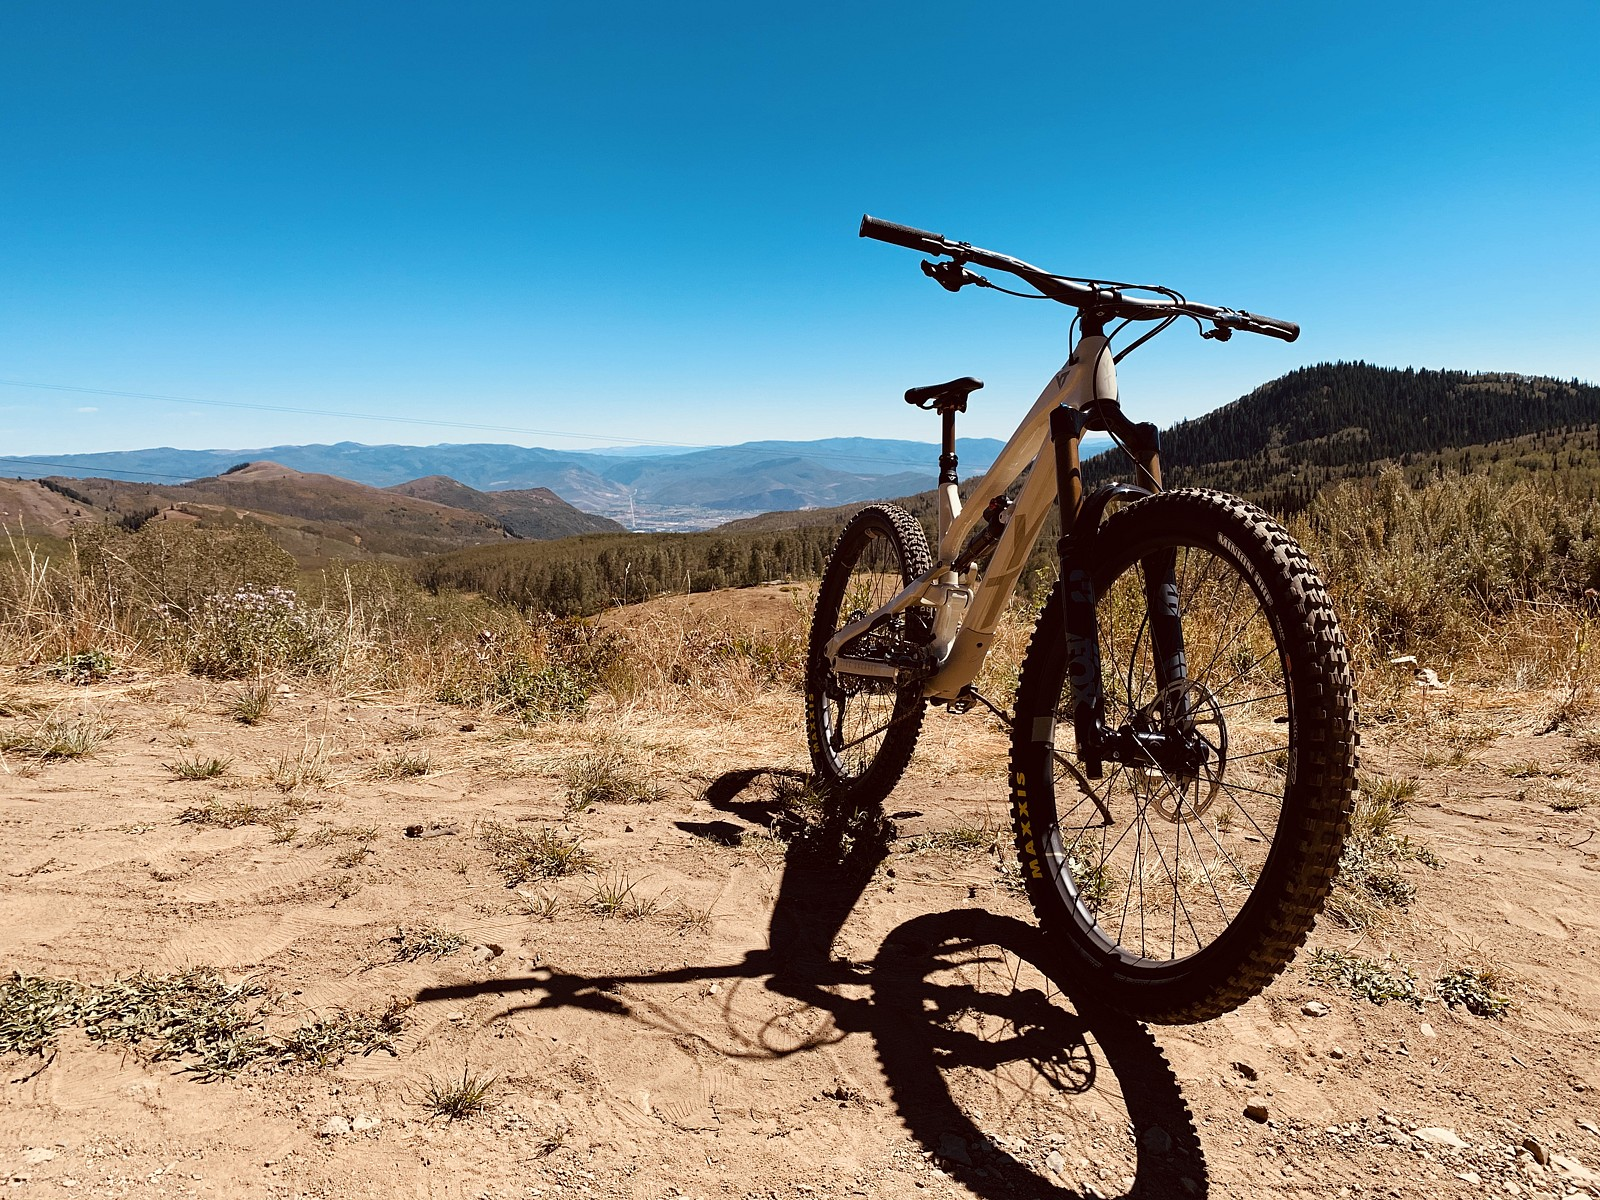 IMG E0212 - jaykalafatis - Mountain Biking Pictures - Vital MTB